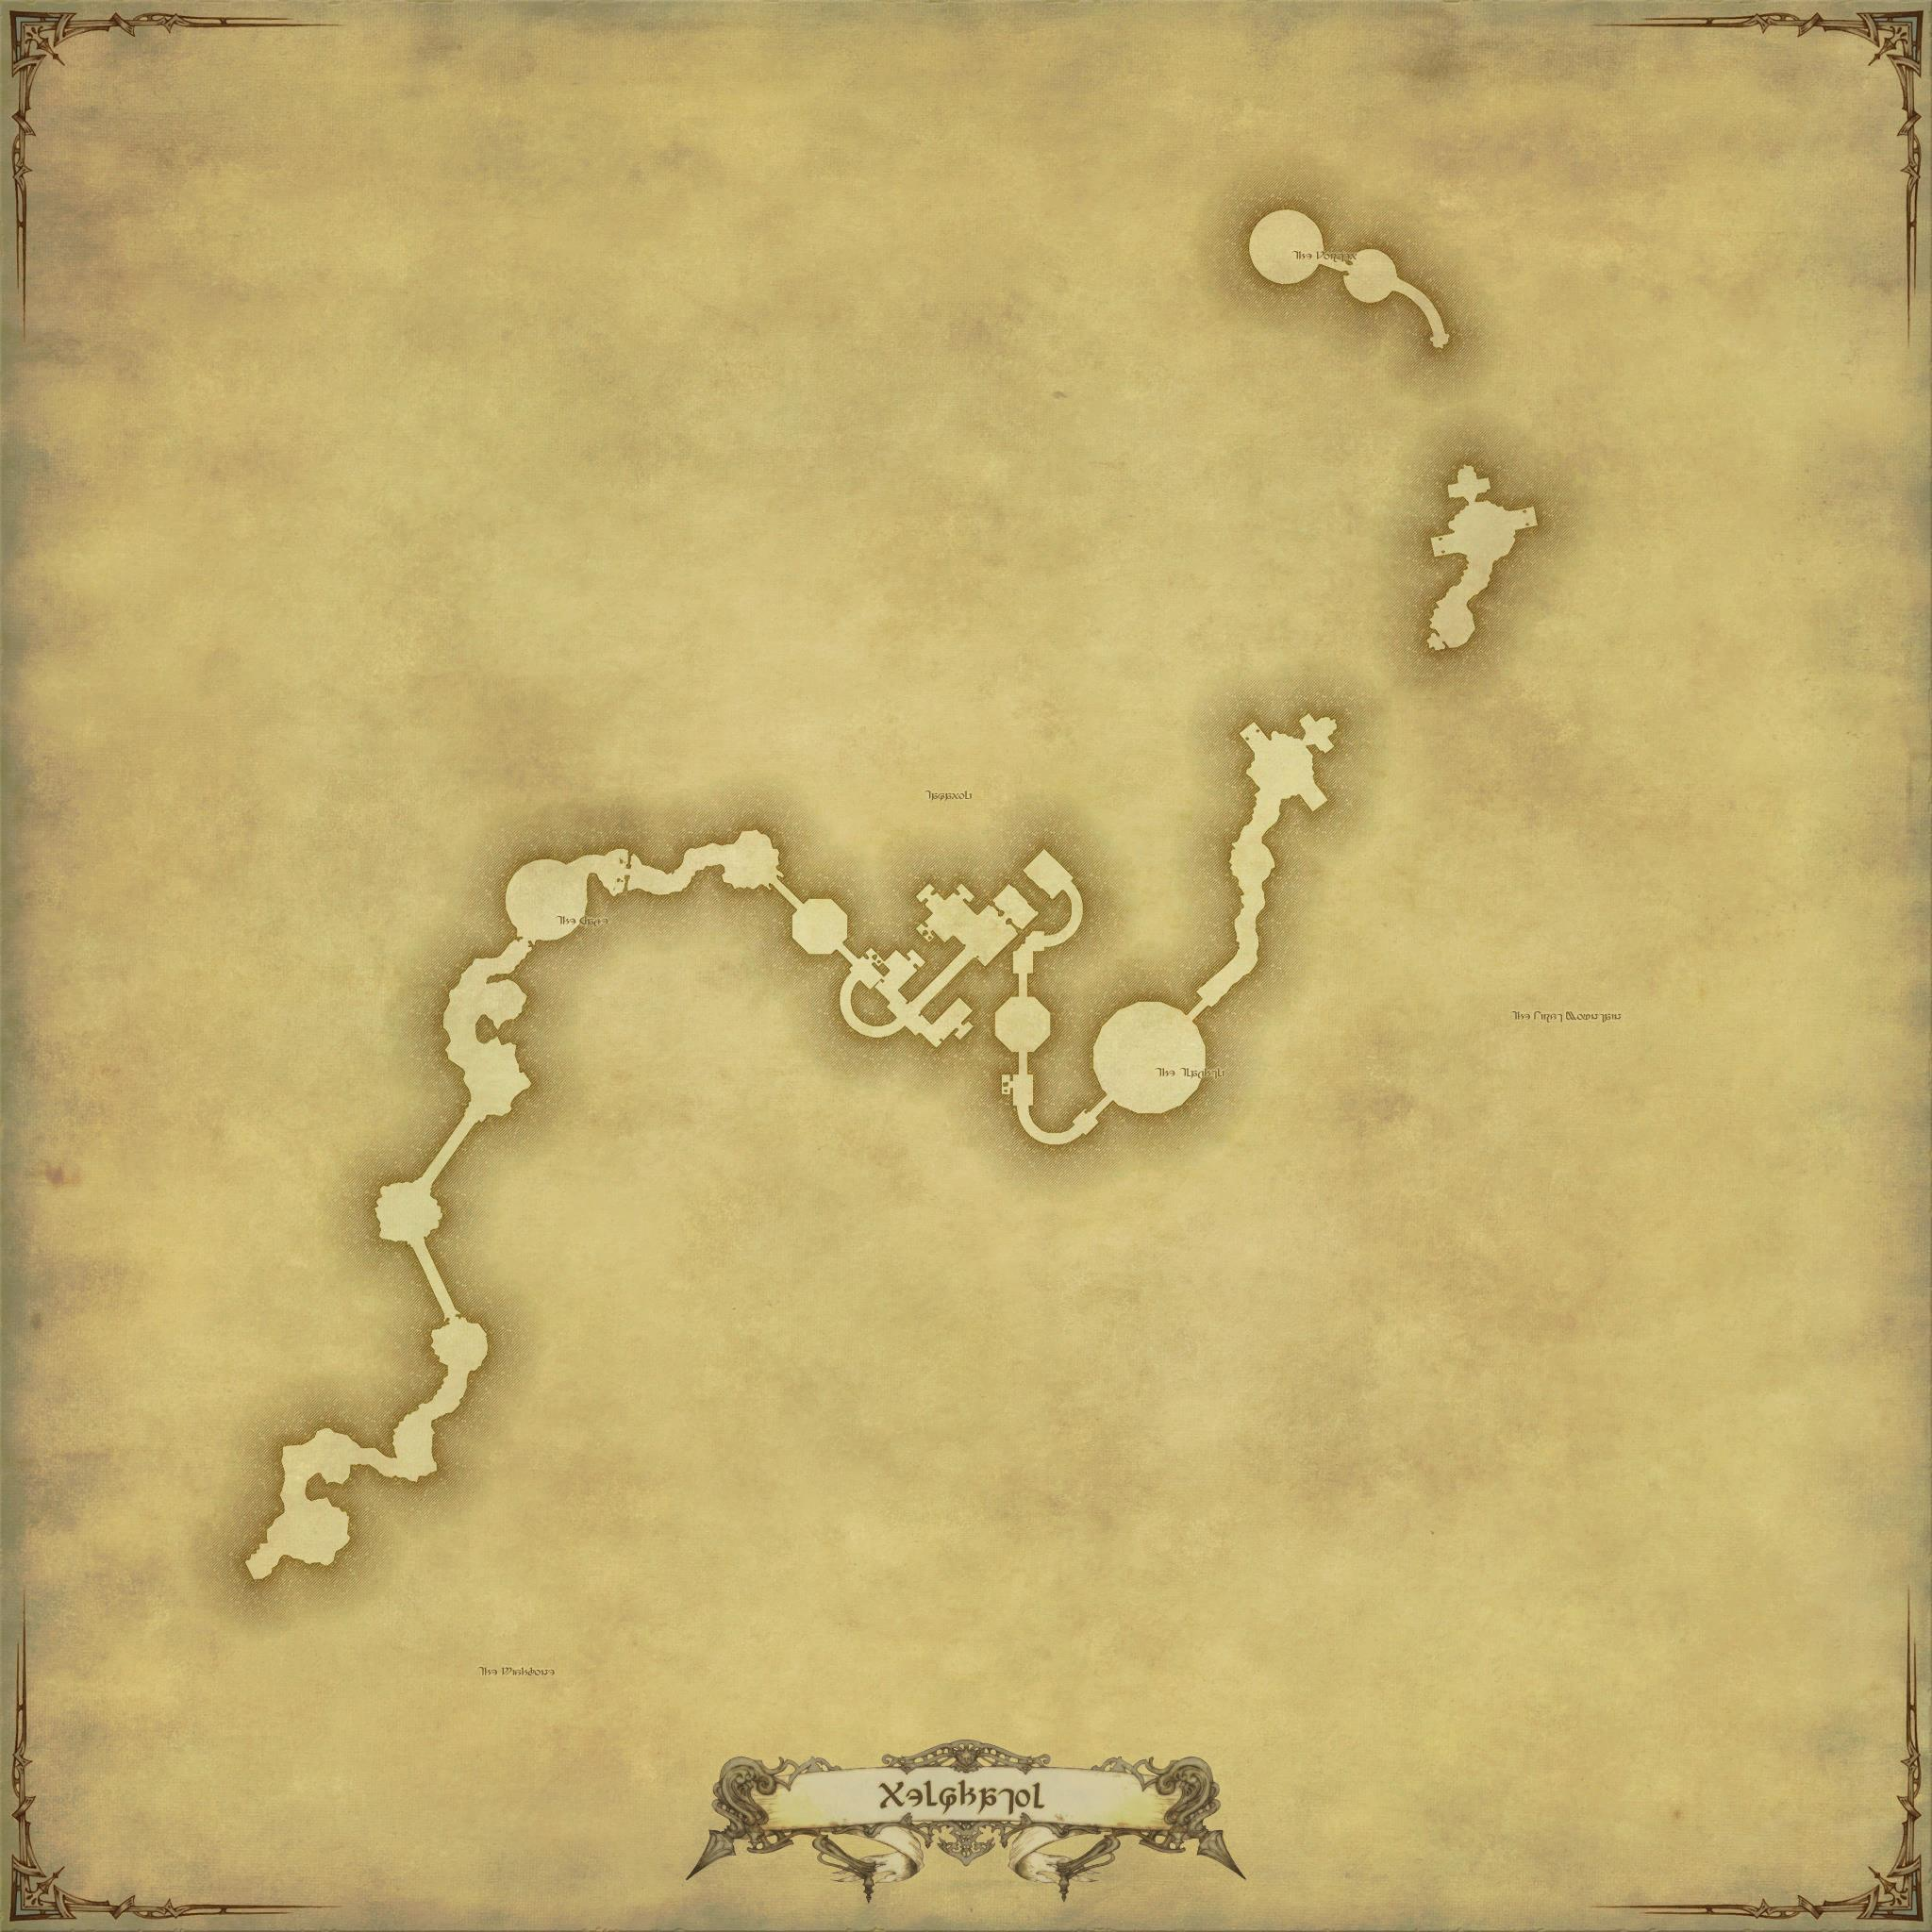 Xelphatol - Guide, Loot, map | FFXIV: Heavensward Info